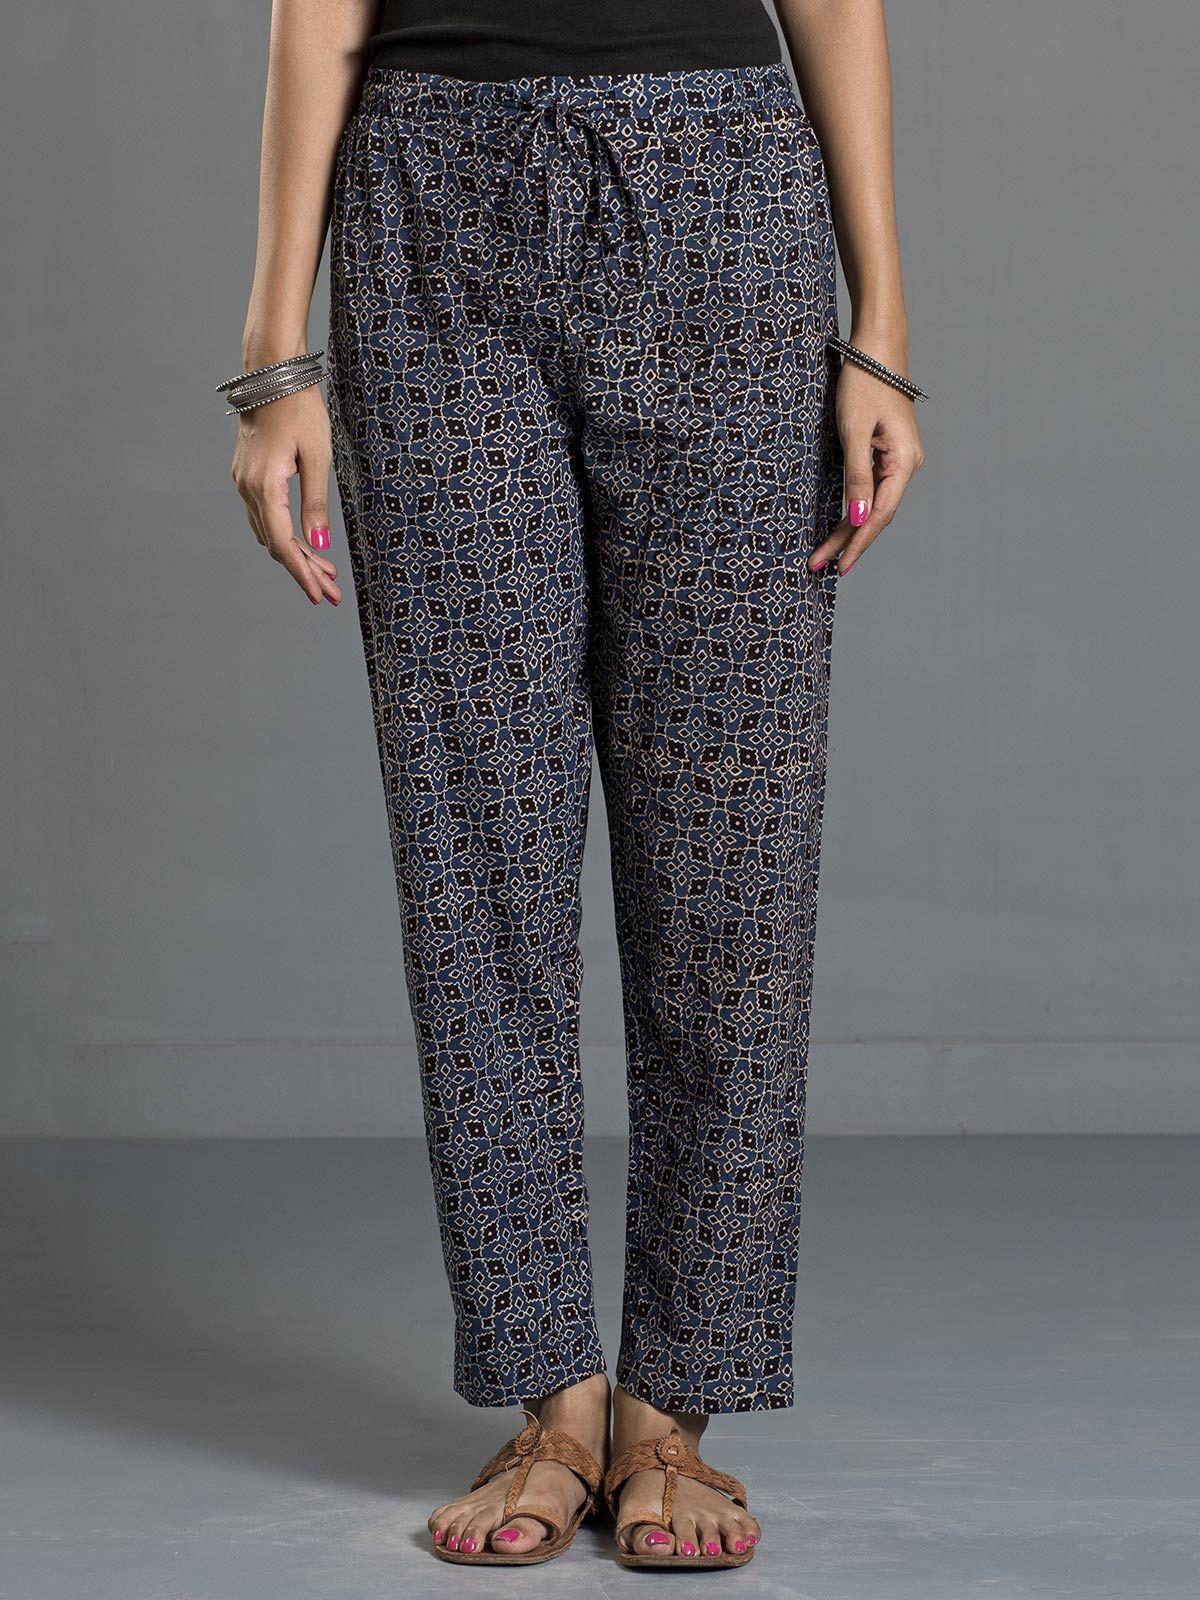 Indigo Ajrak Printed Tie-up Cotton Pants